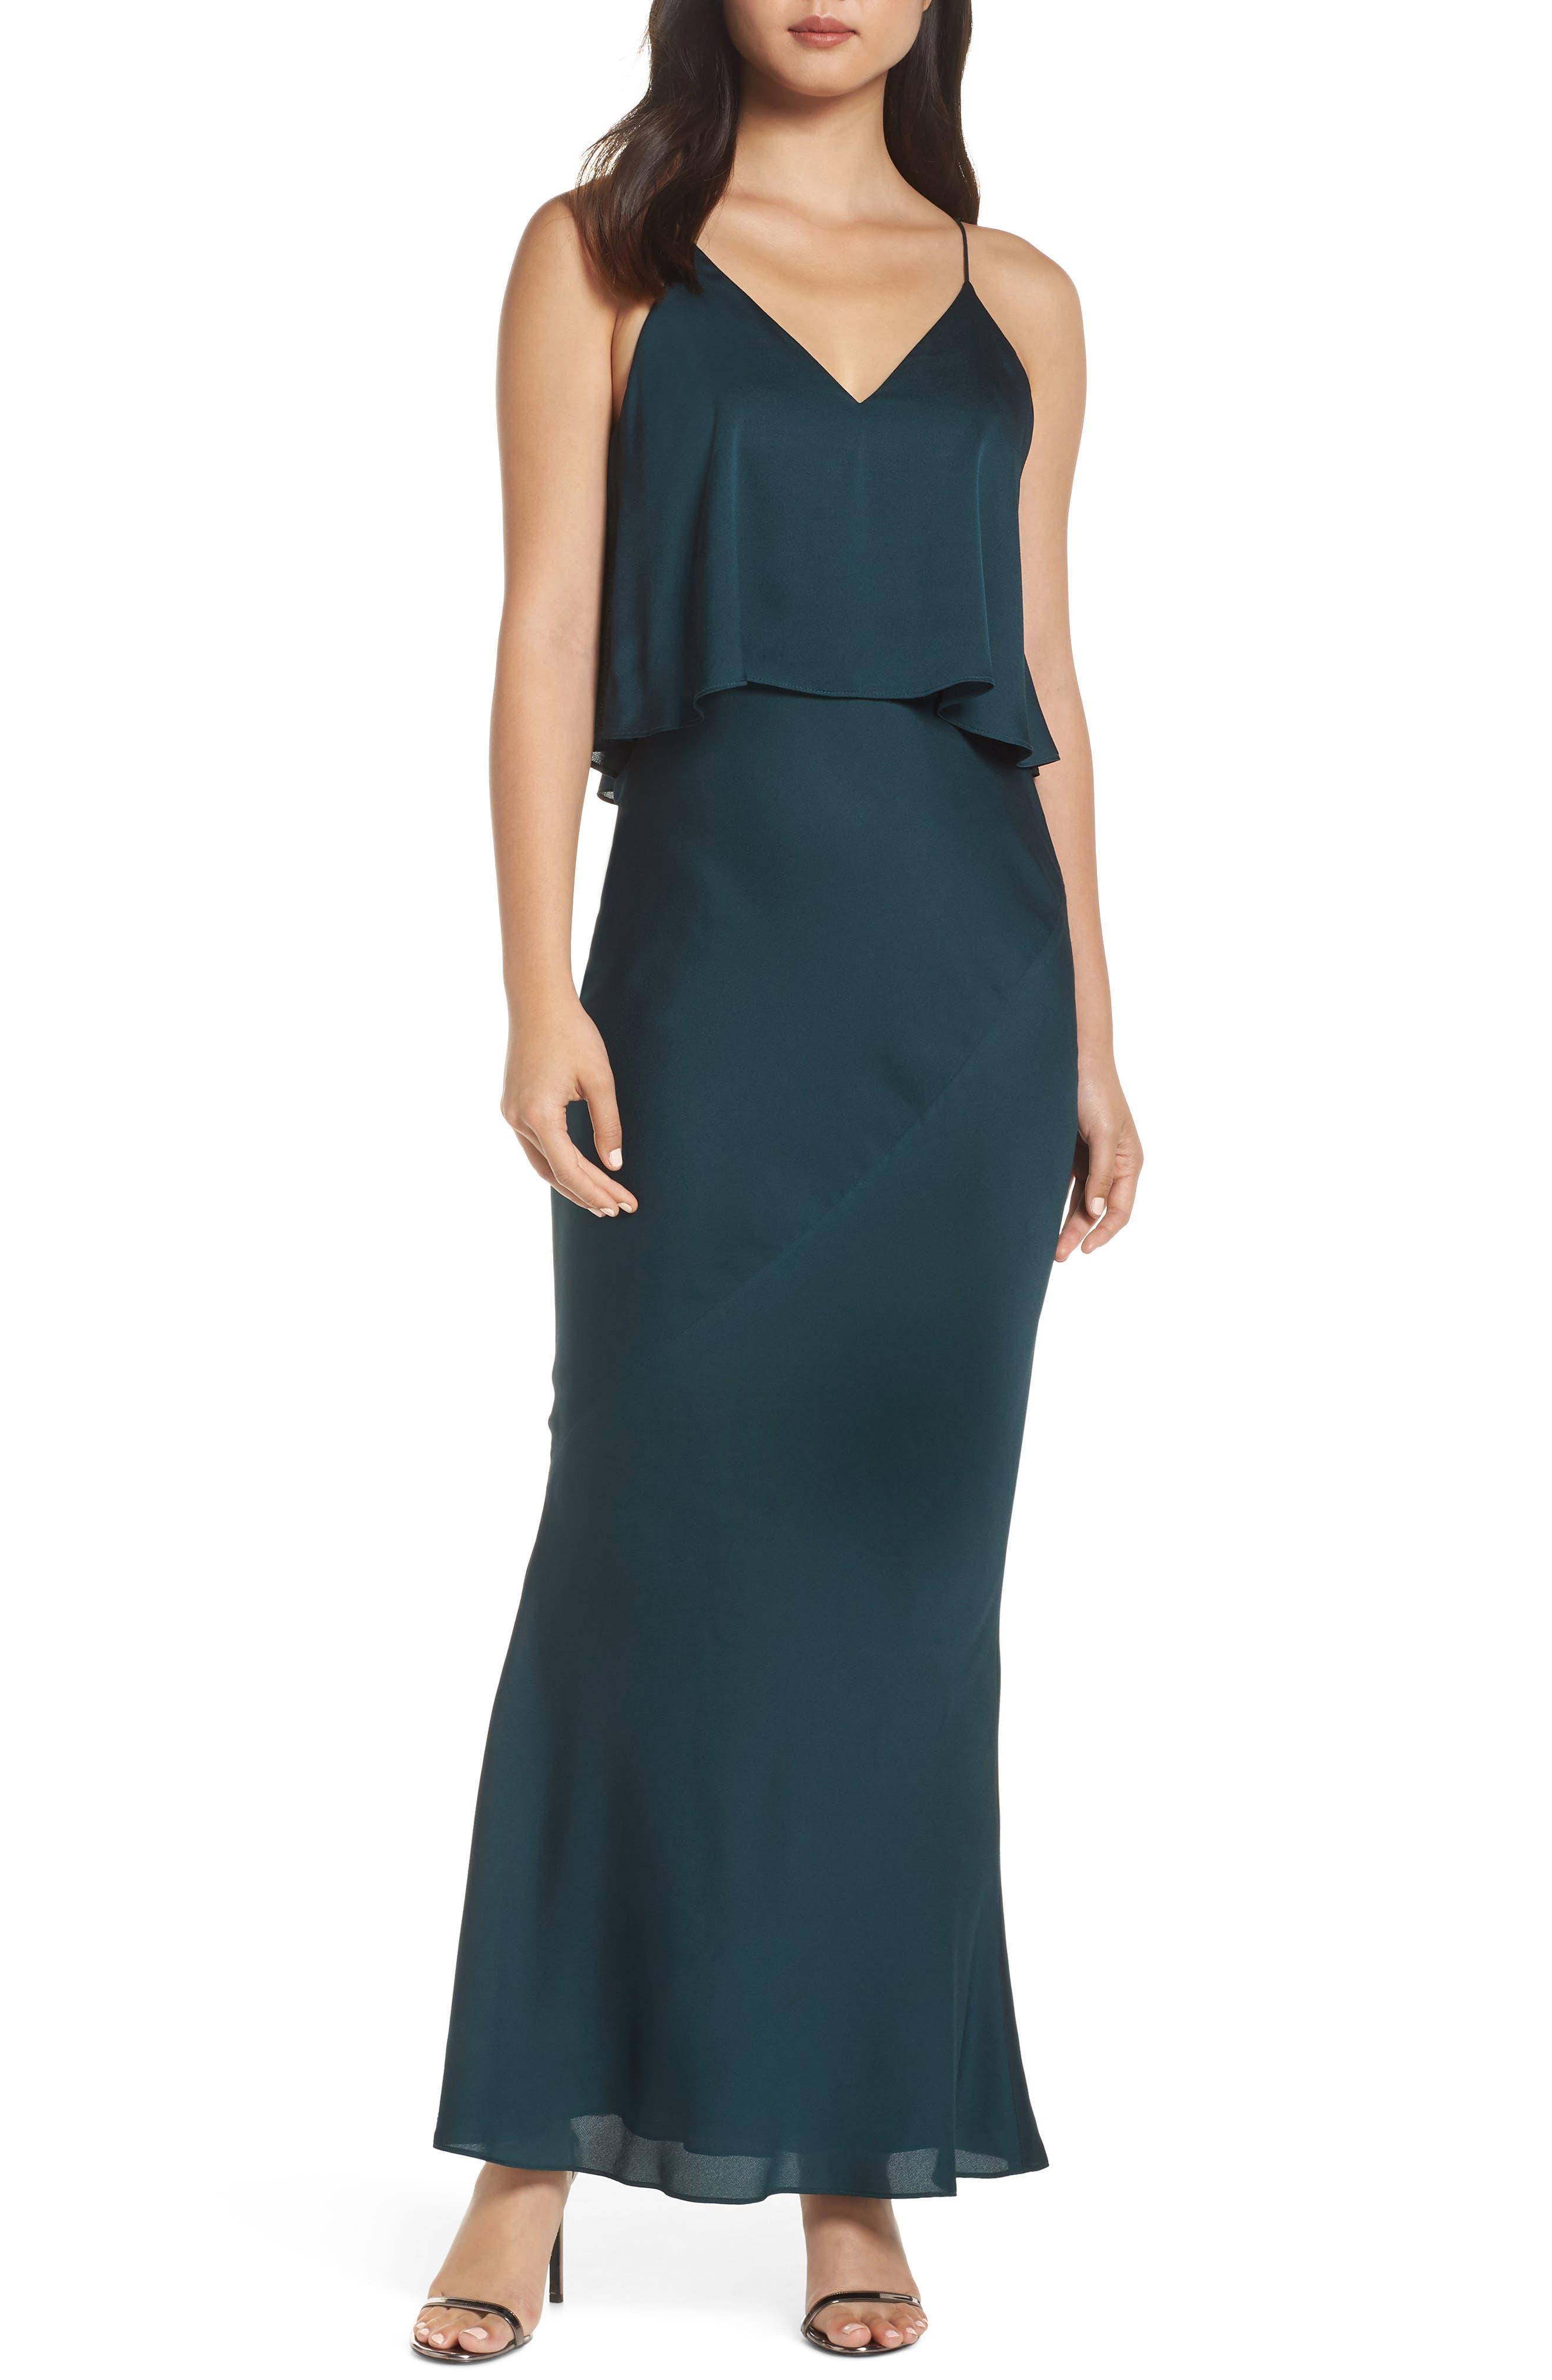 SHONA JOY Luxe Frilled Bodice Bias Cut Gown in Emerald